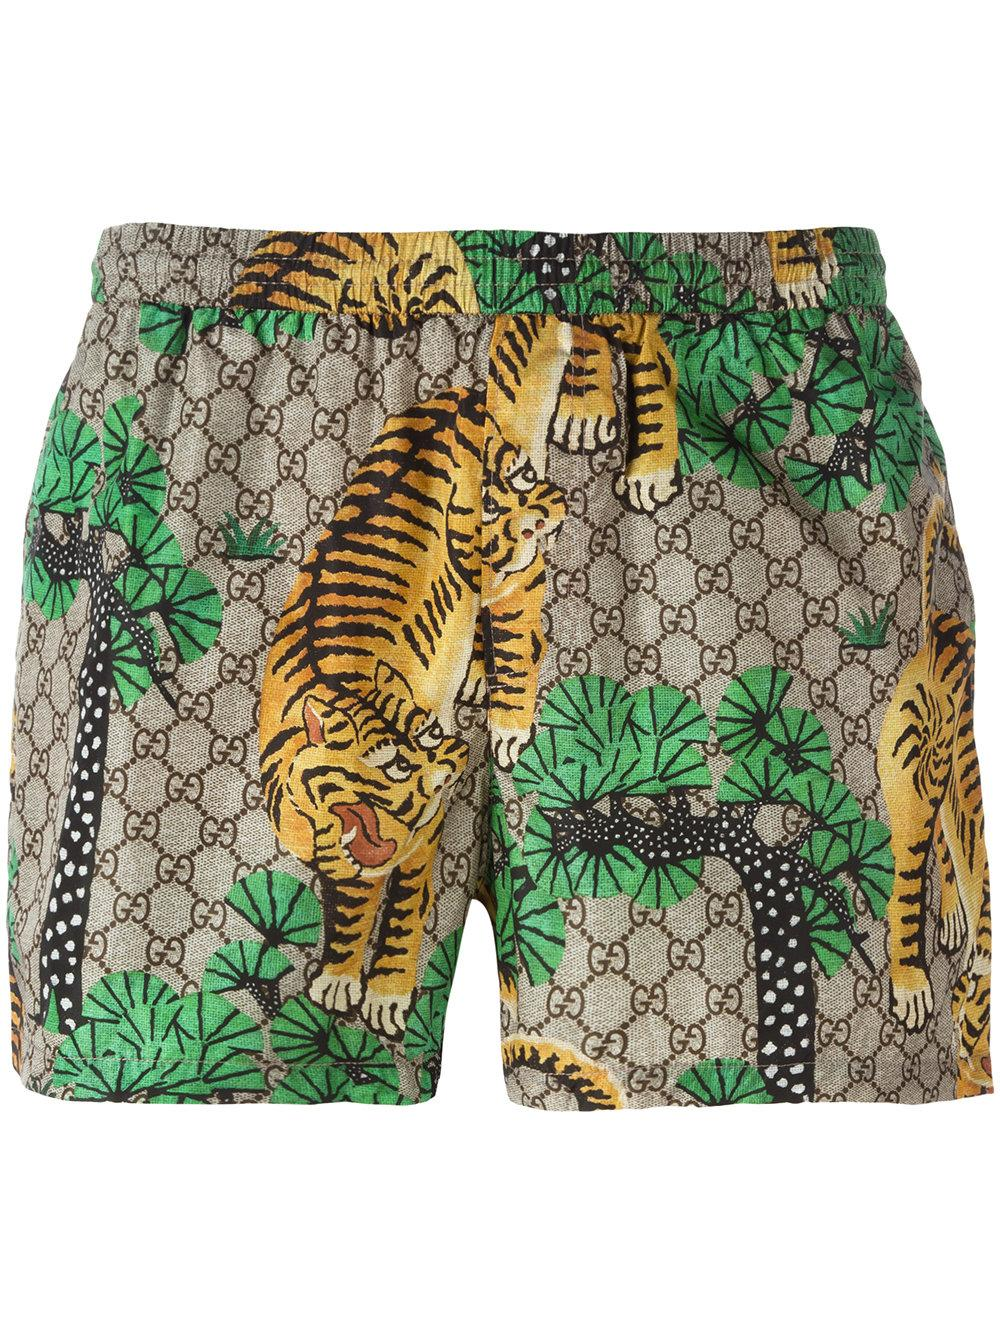 01e55202eb Gucci Bengal Swim Shorts in Green for Men - Lyst